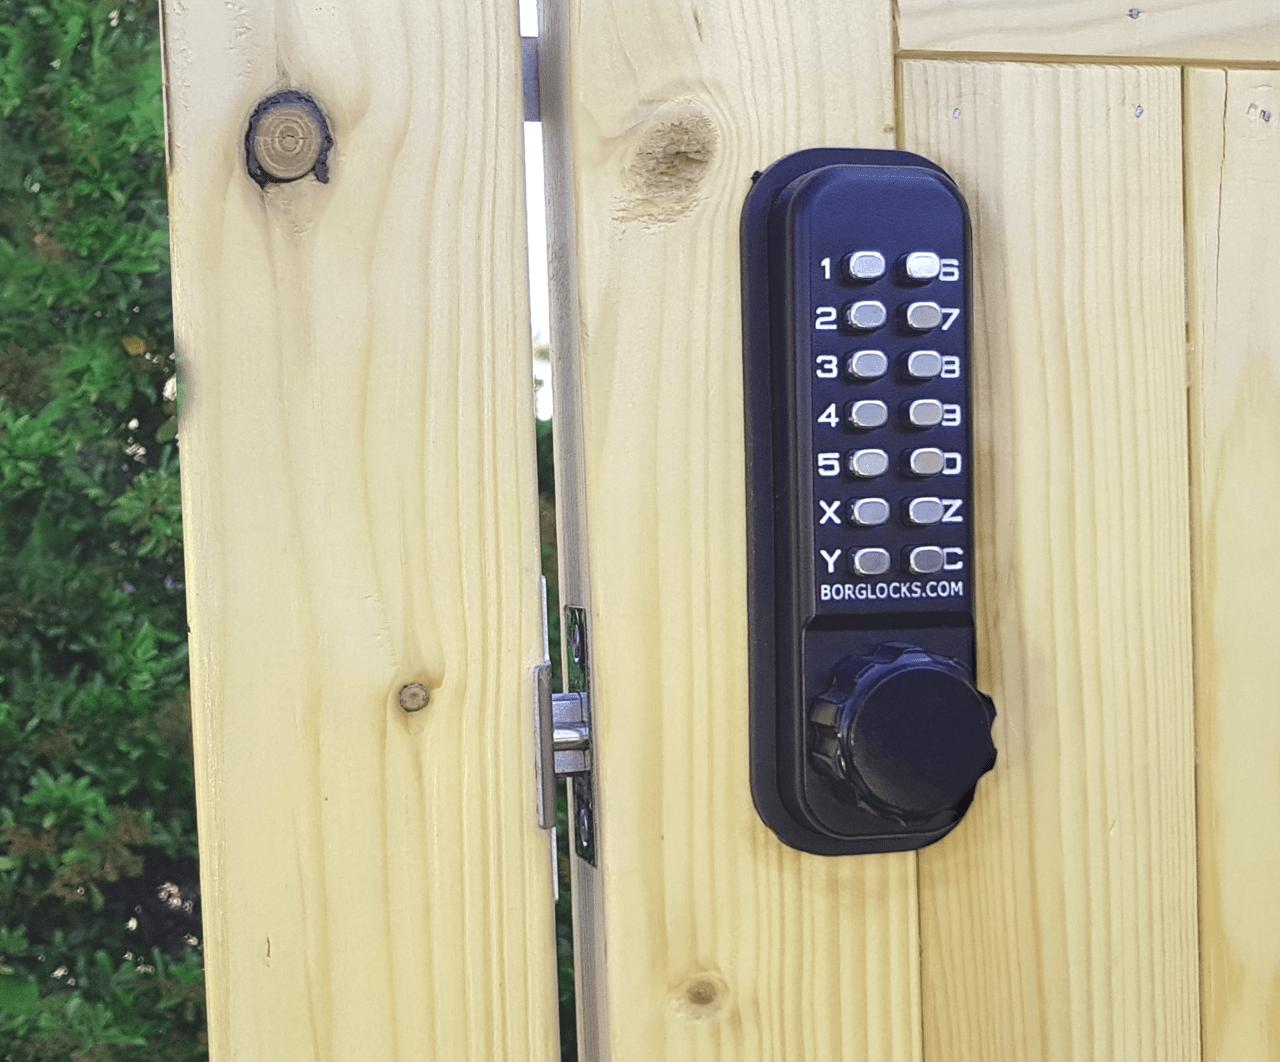 BL2601 digital combination gate lock from Borg Locks